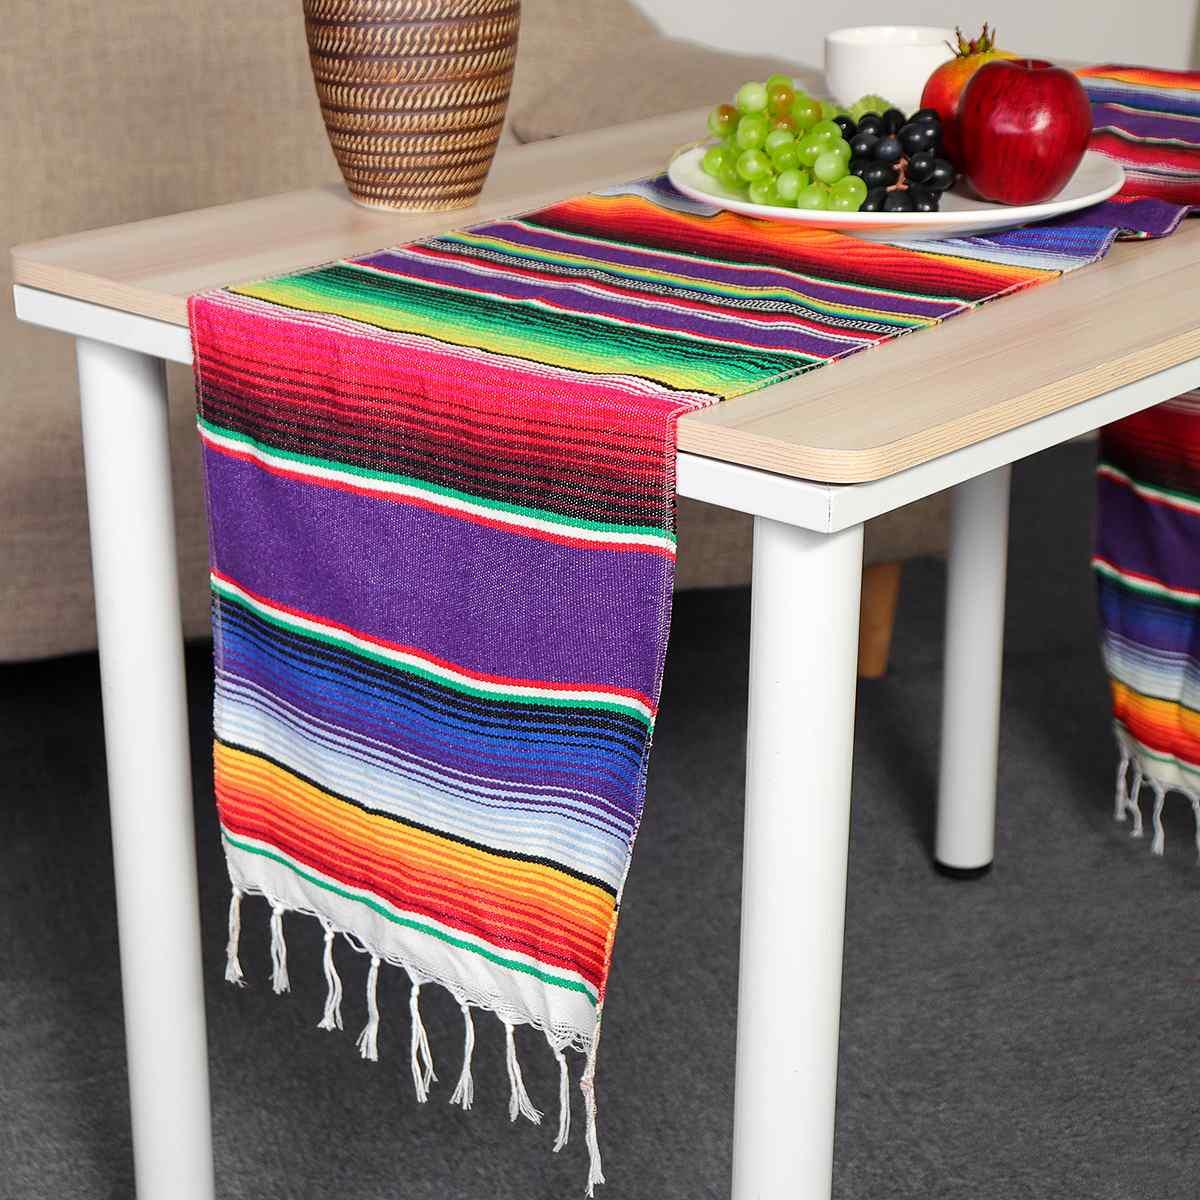 5PCS 코 튼 멕시코 테이블 러너 3 색 213X35cm 레인 보우 DIY 웨딩 파티 테이블 러너 파티 Serape 식탁보 홈 장식